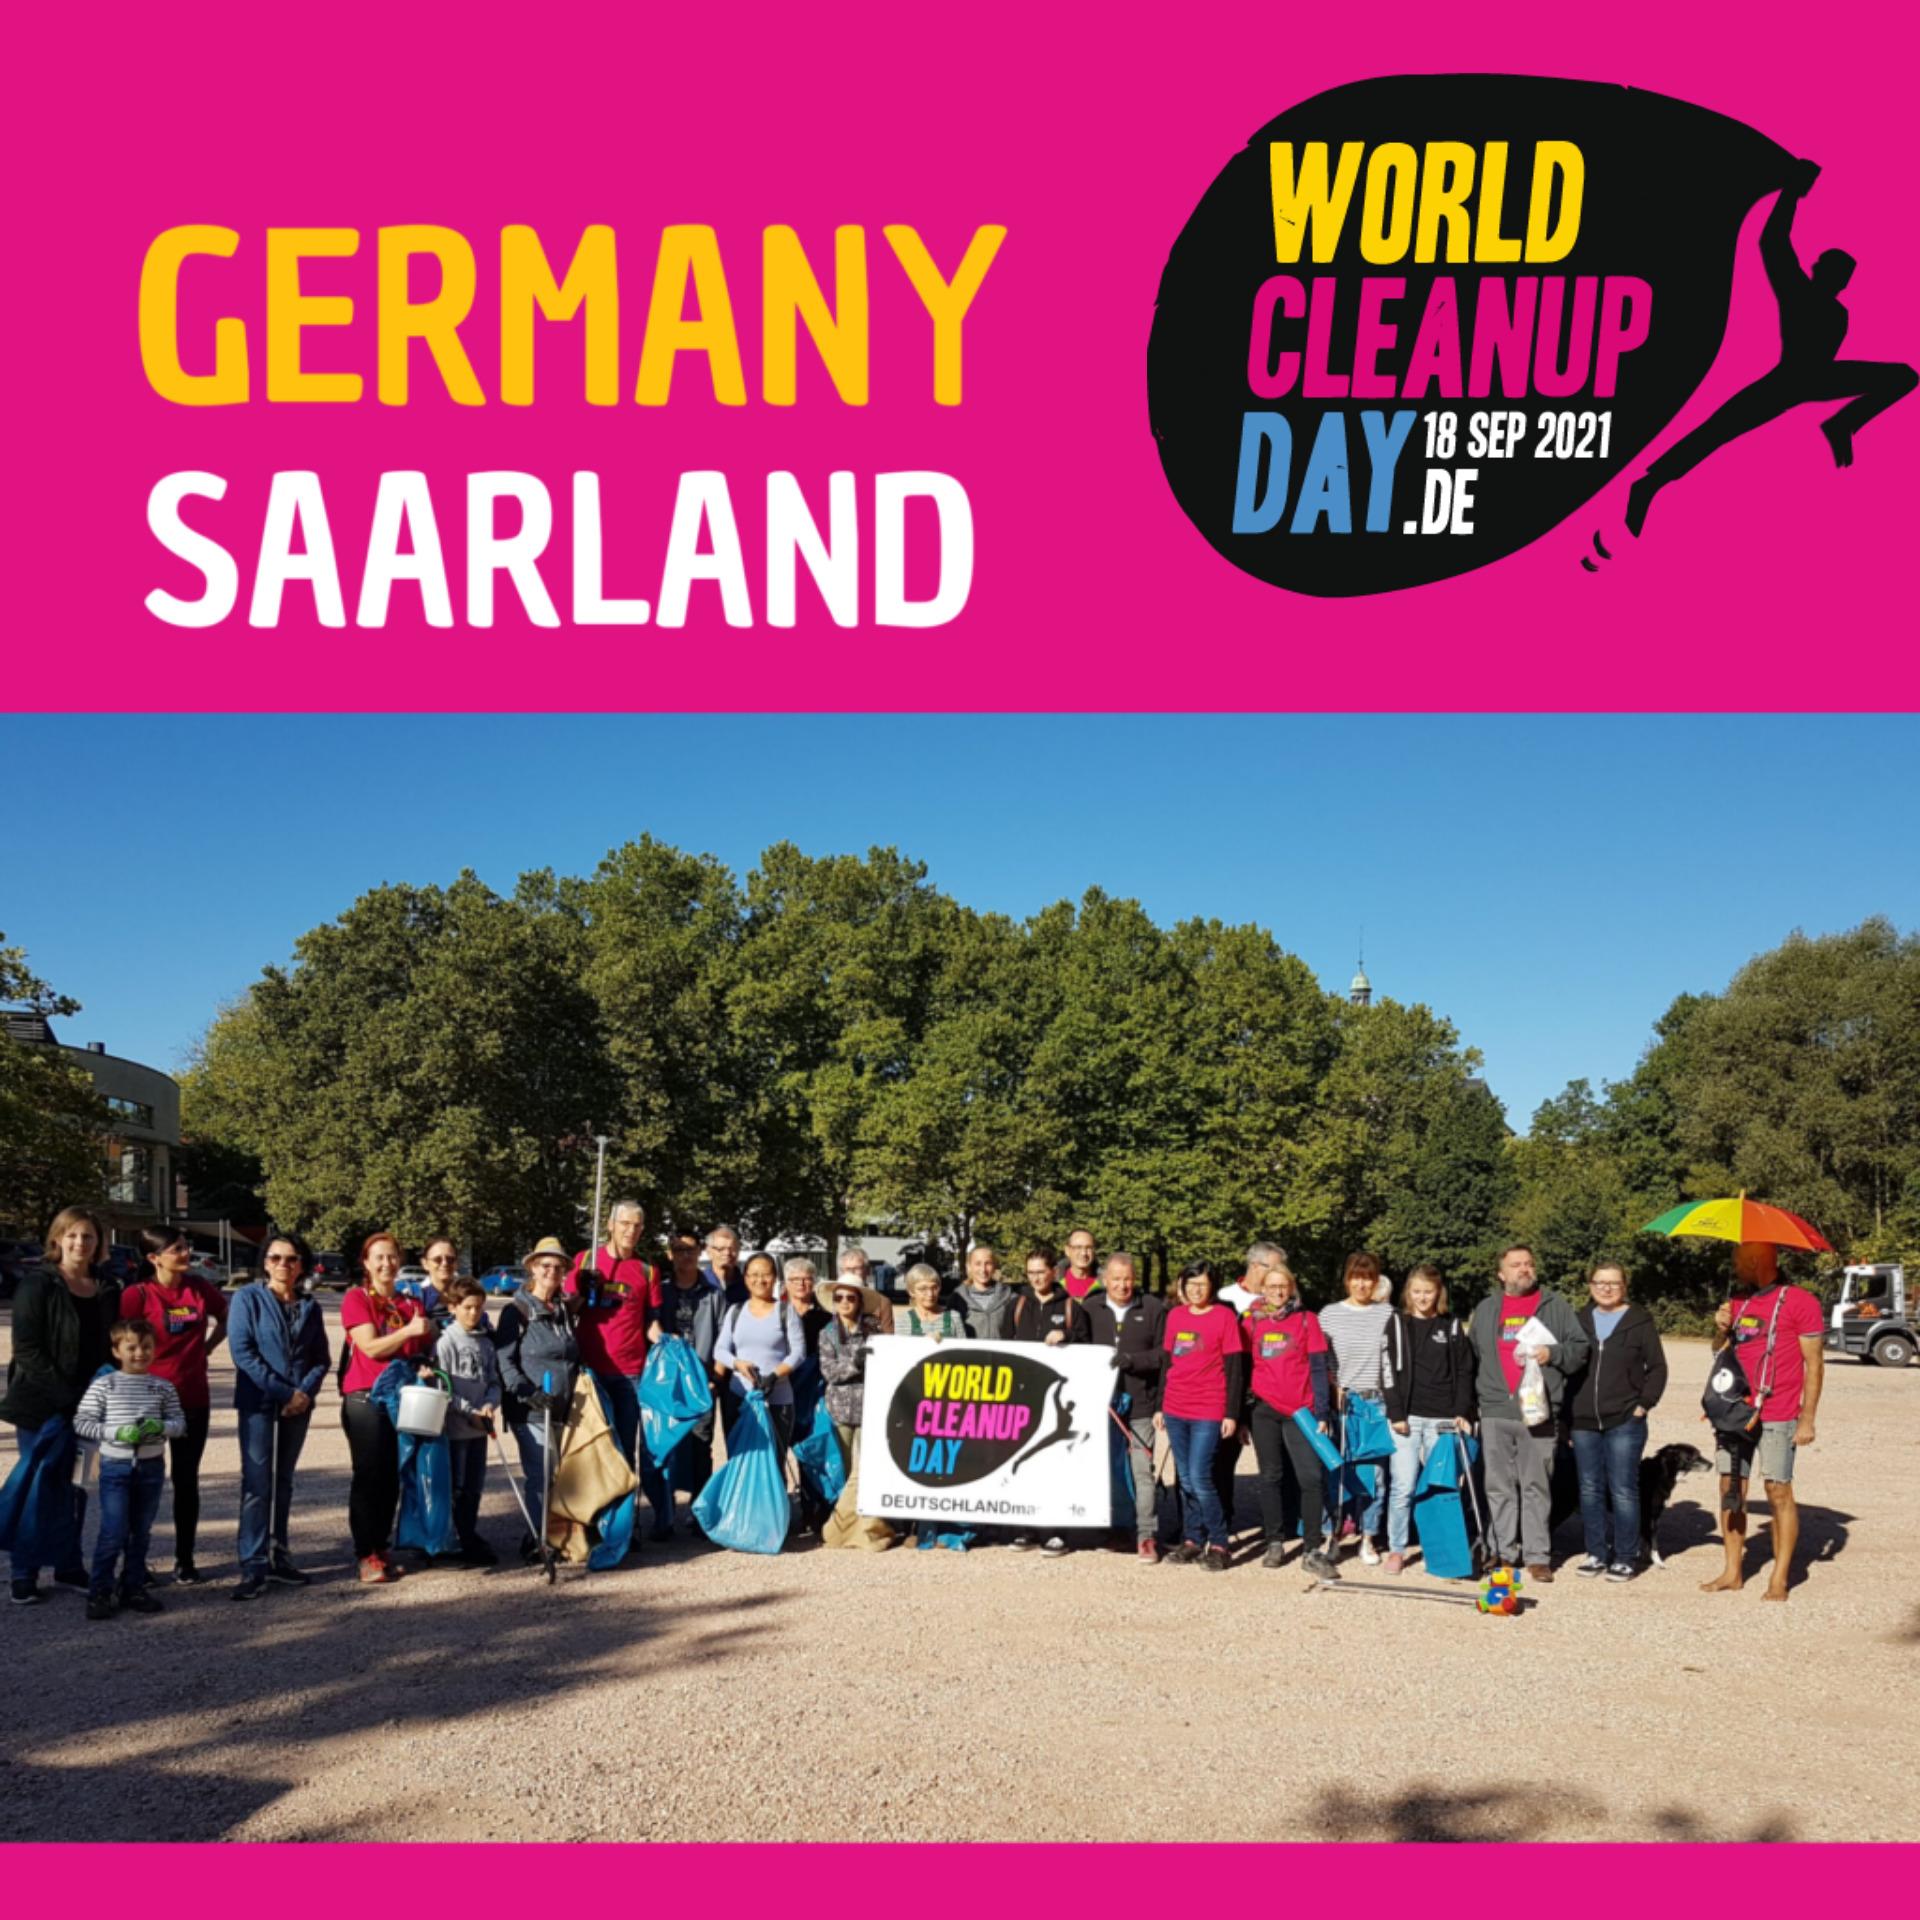 World Cleanup Day in Hirzweiler (Saarland)